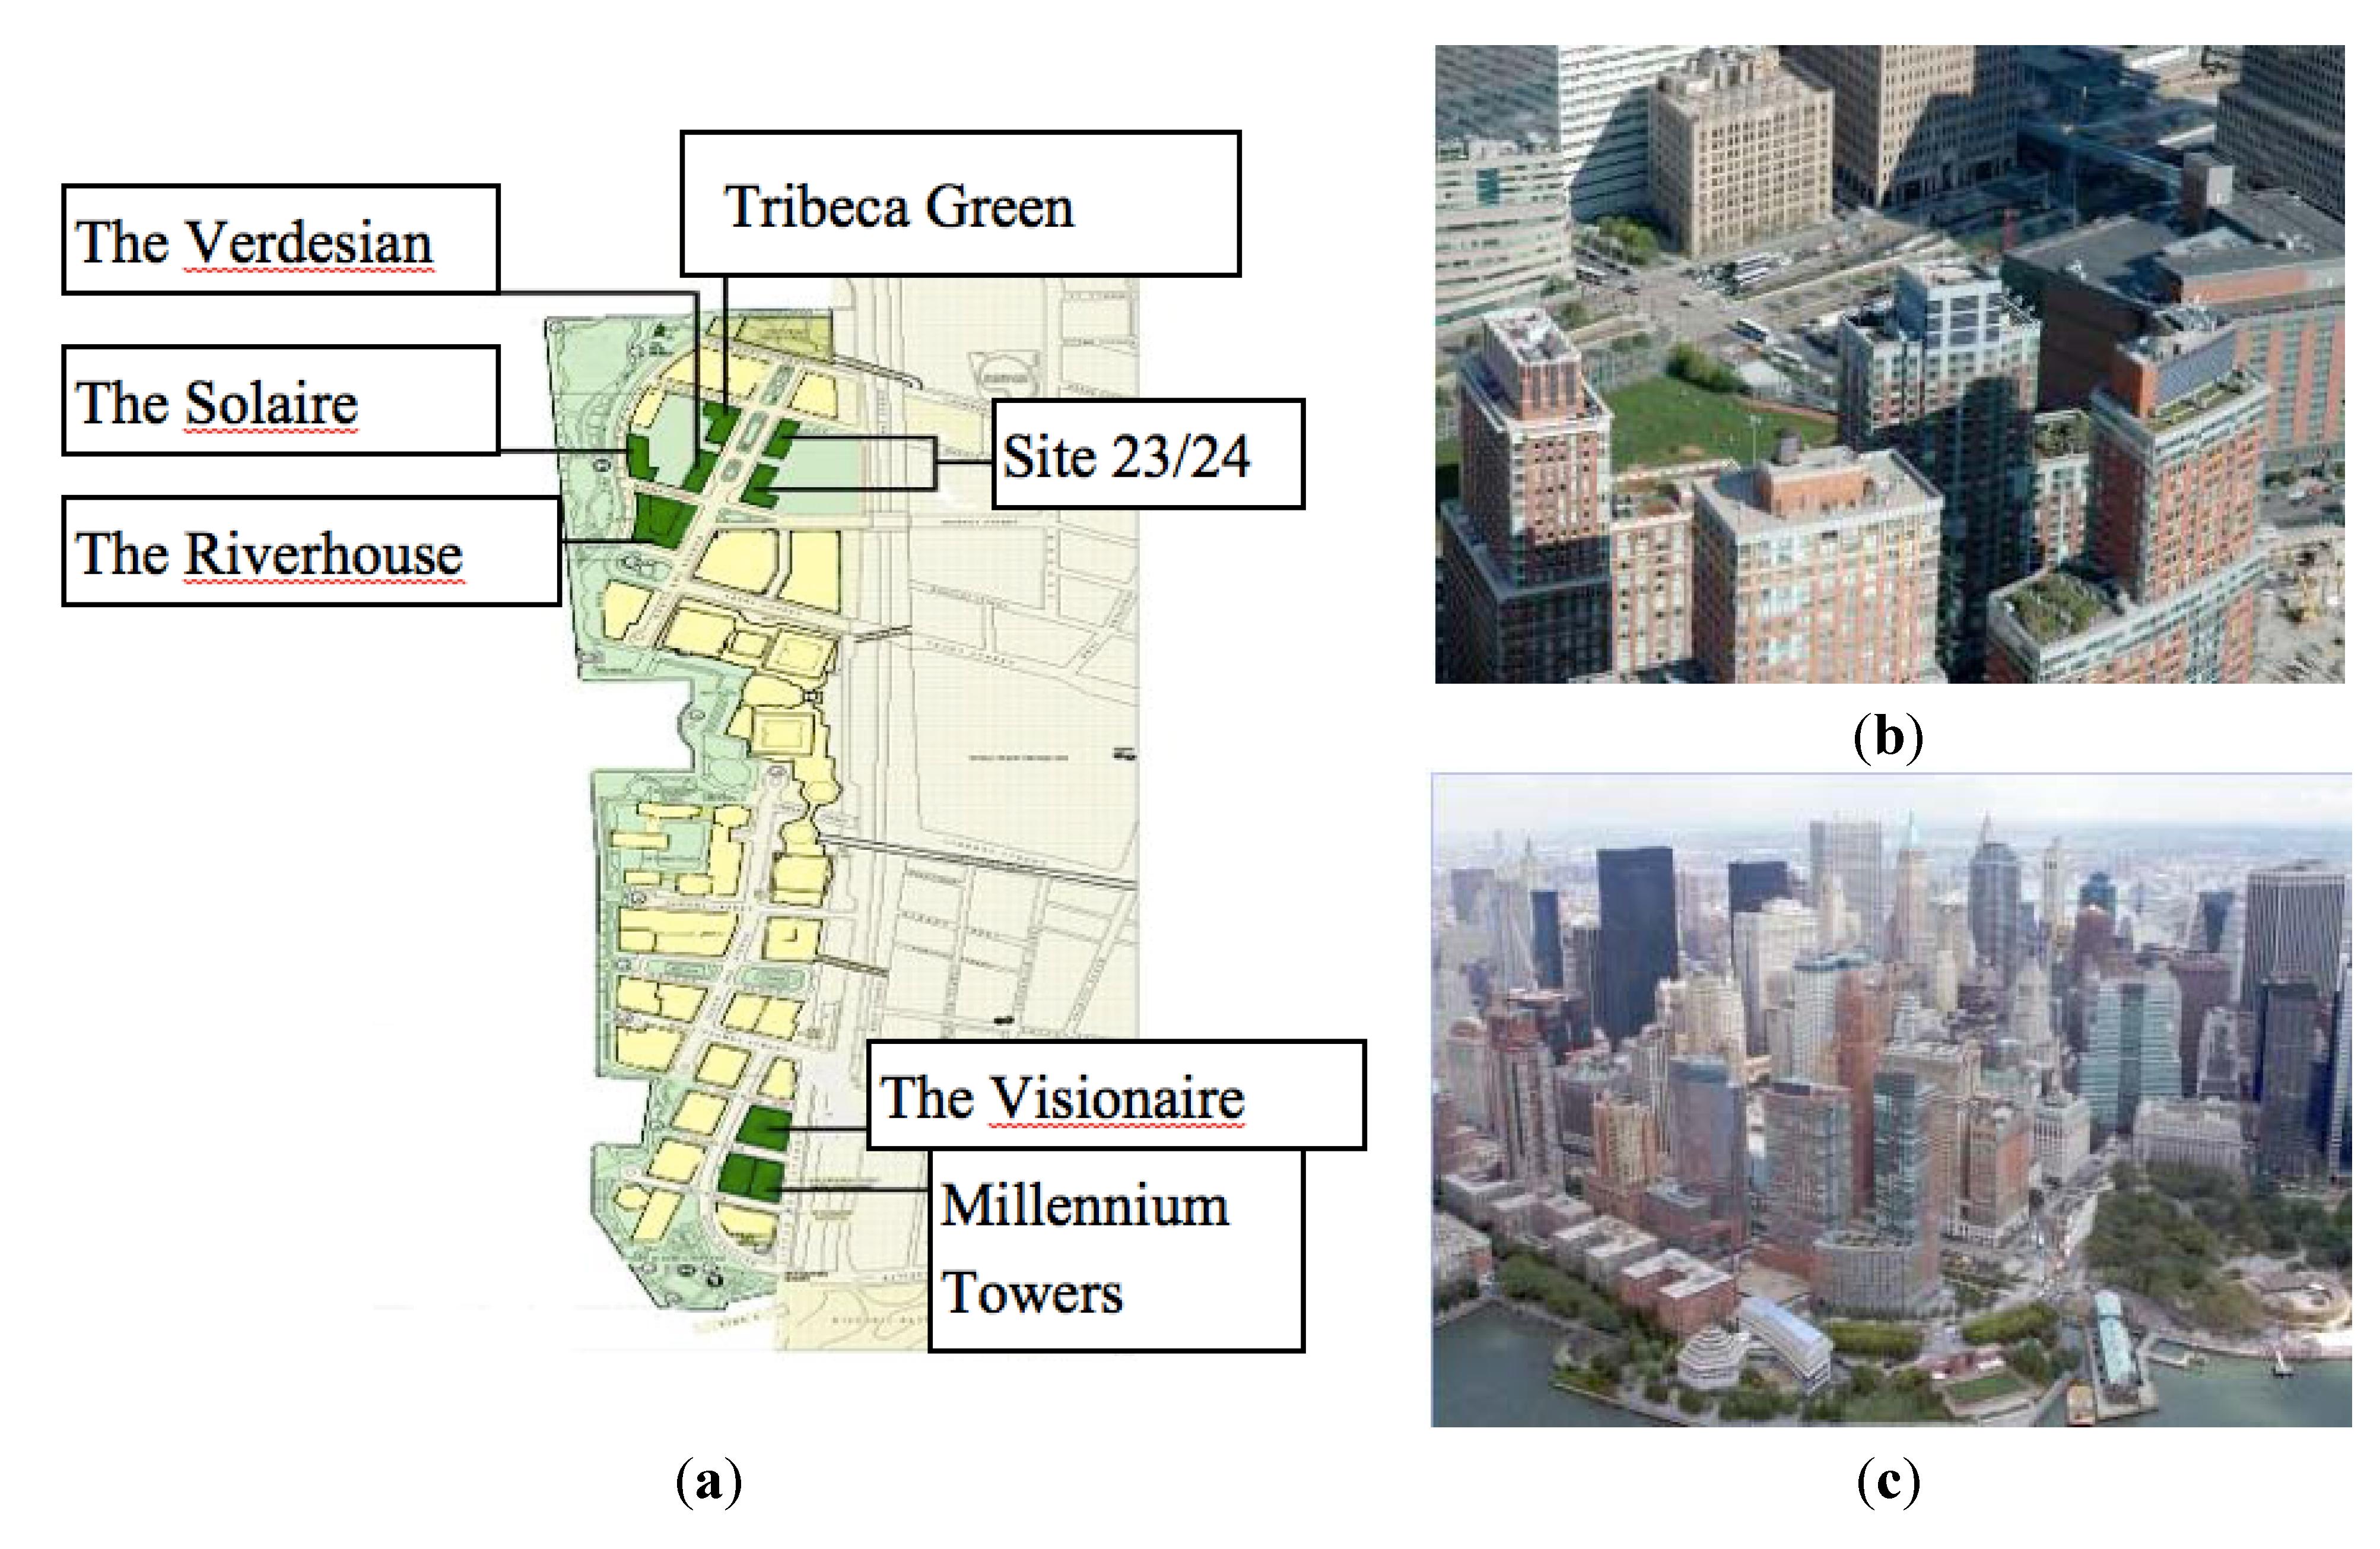 multimodal logitics parks design